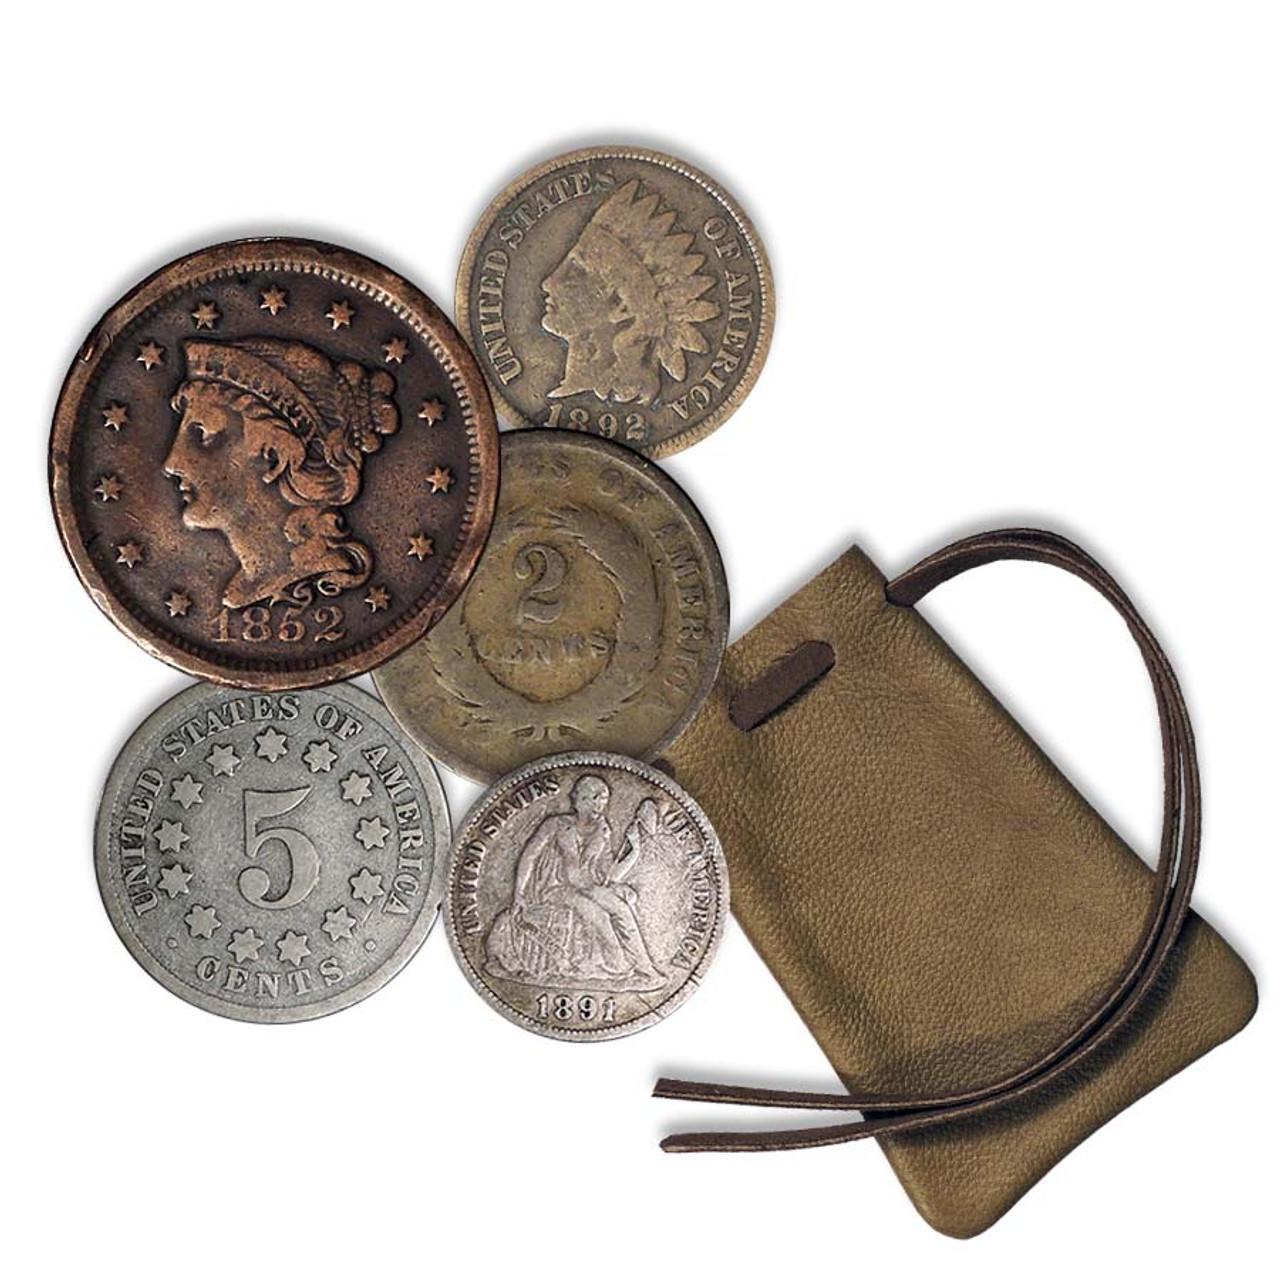 Cowpoke Collection 5-Coin Image 1